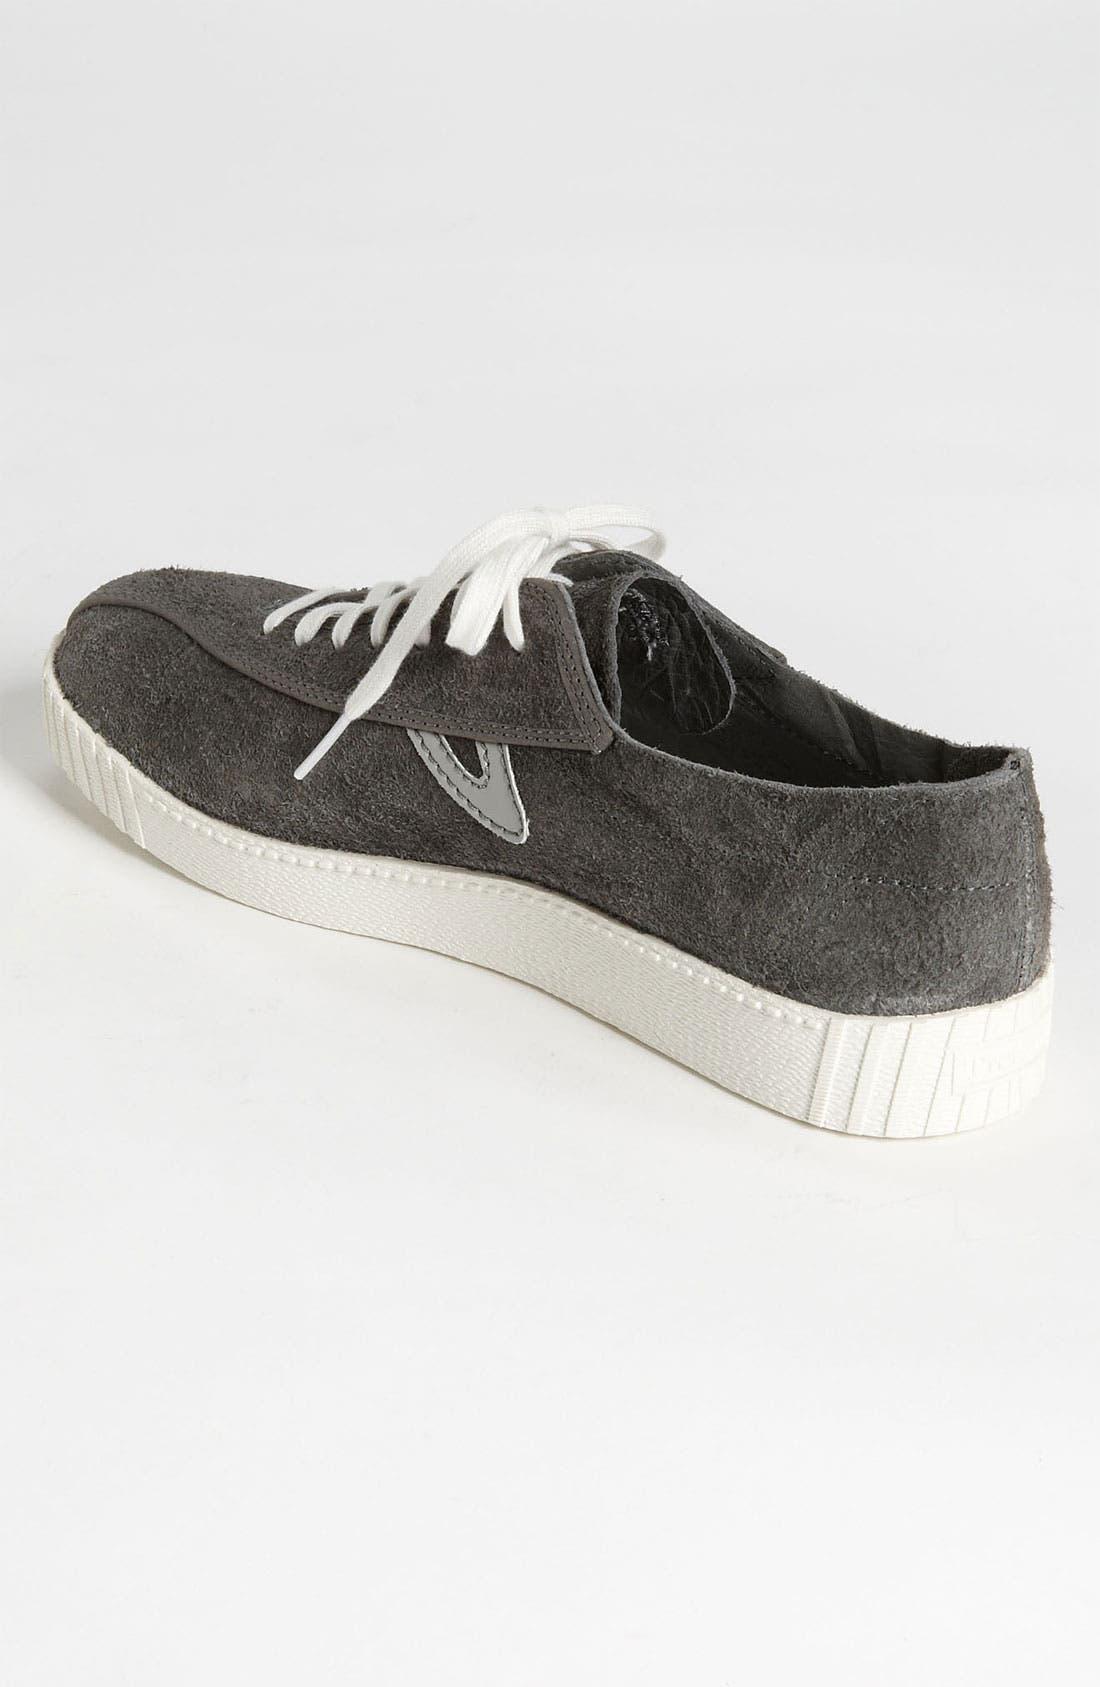 Alternate Image 2  - Tretorn 'Nylite' Reverse Leather Sneaker